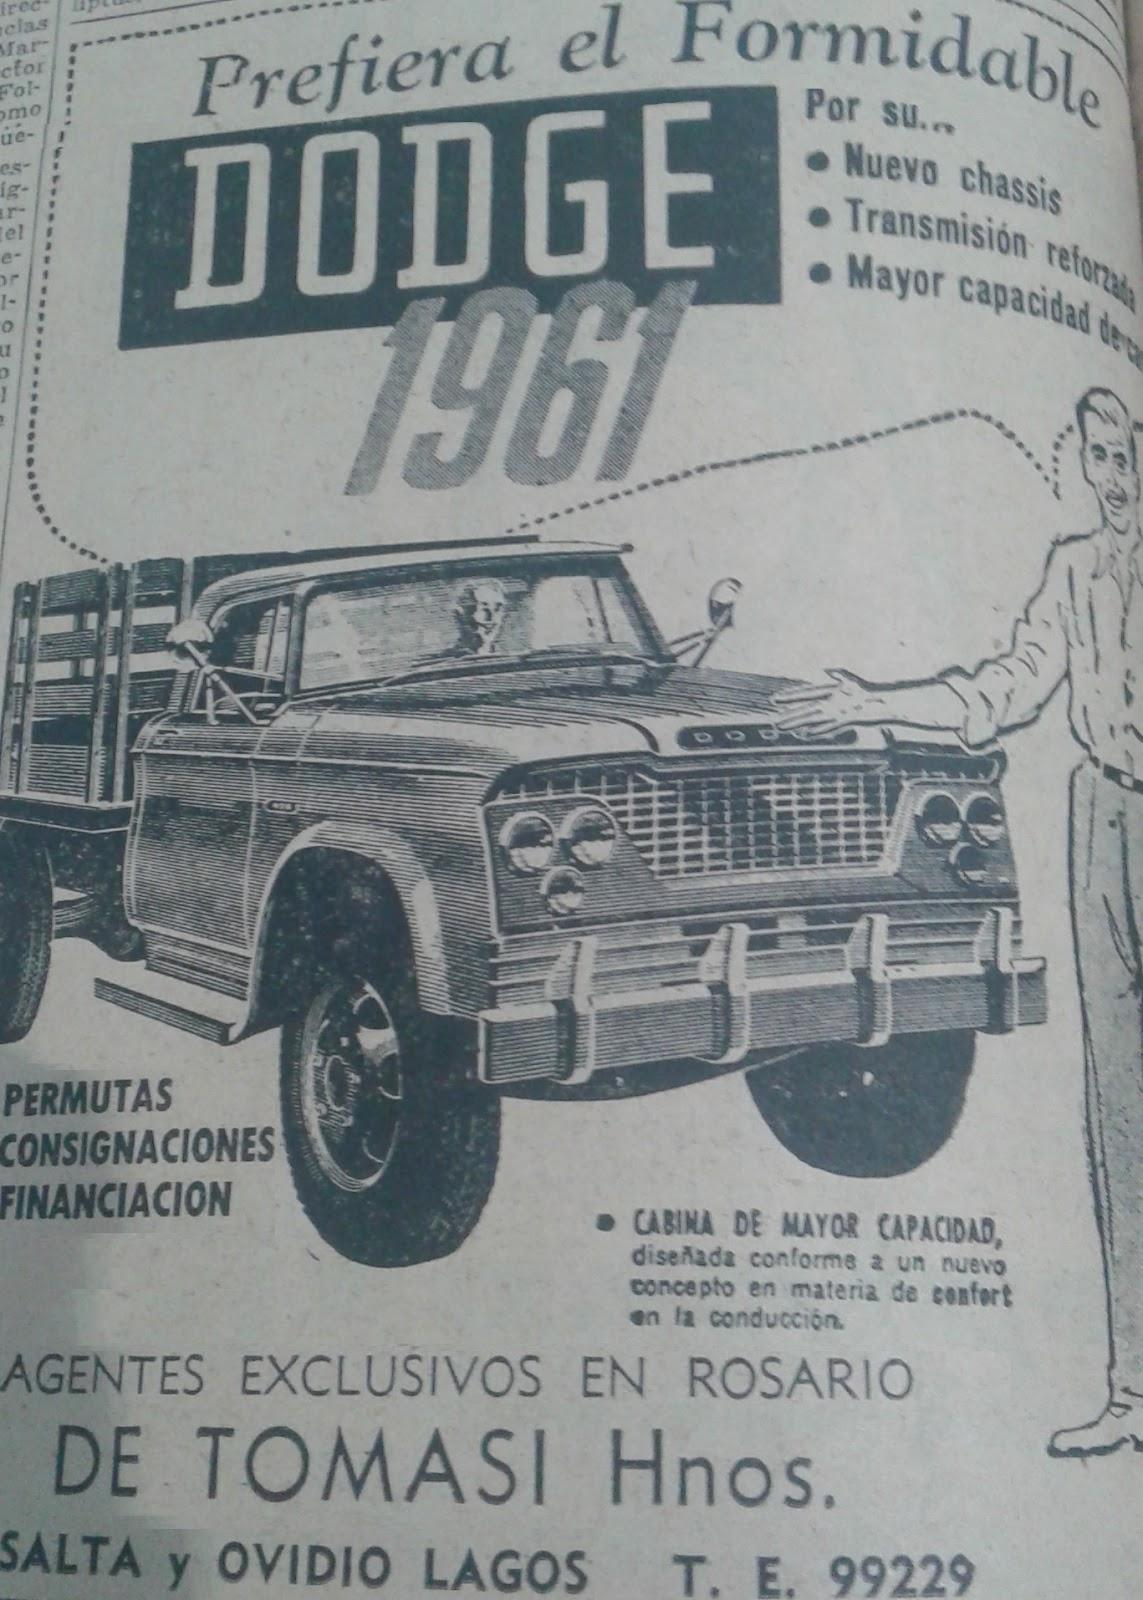 Camión Argentino: Dodge D/DP-400